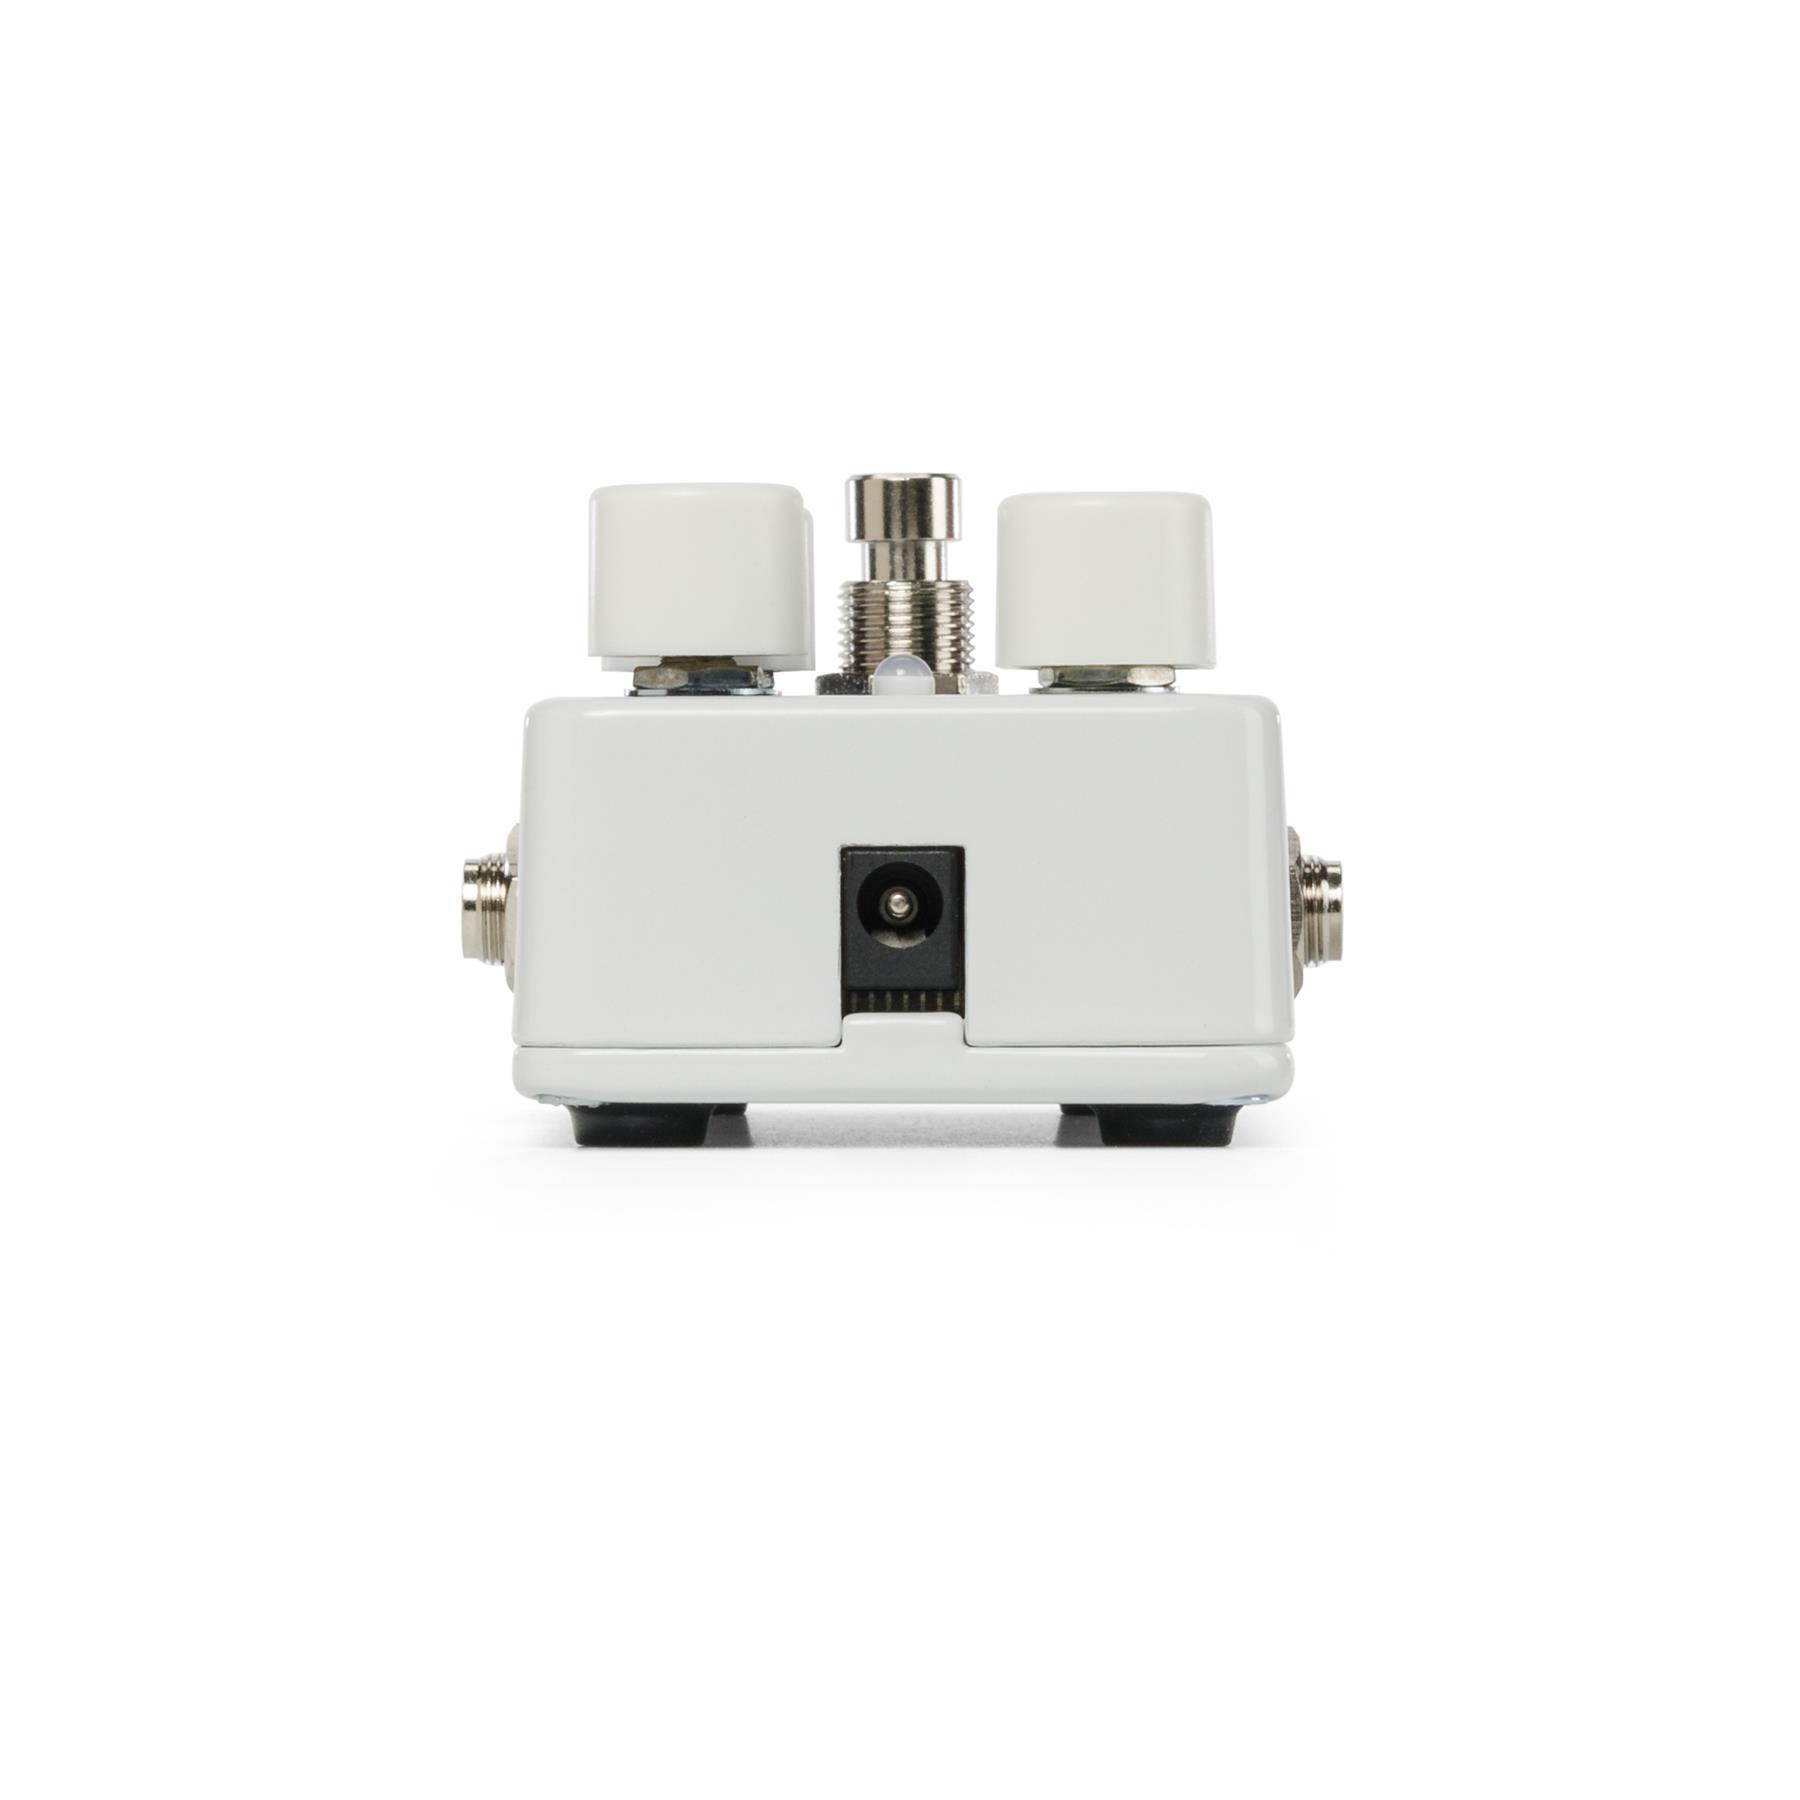 Electro-Harmonix Mod 11 Modulator pedal